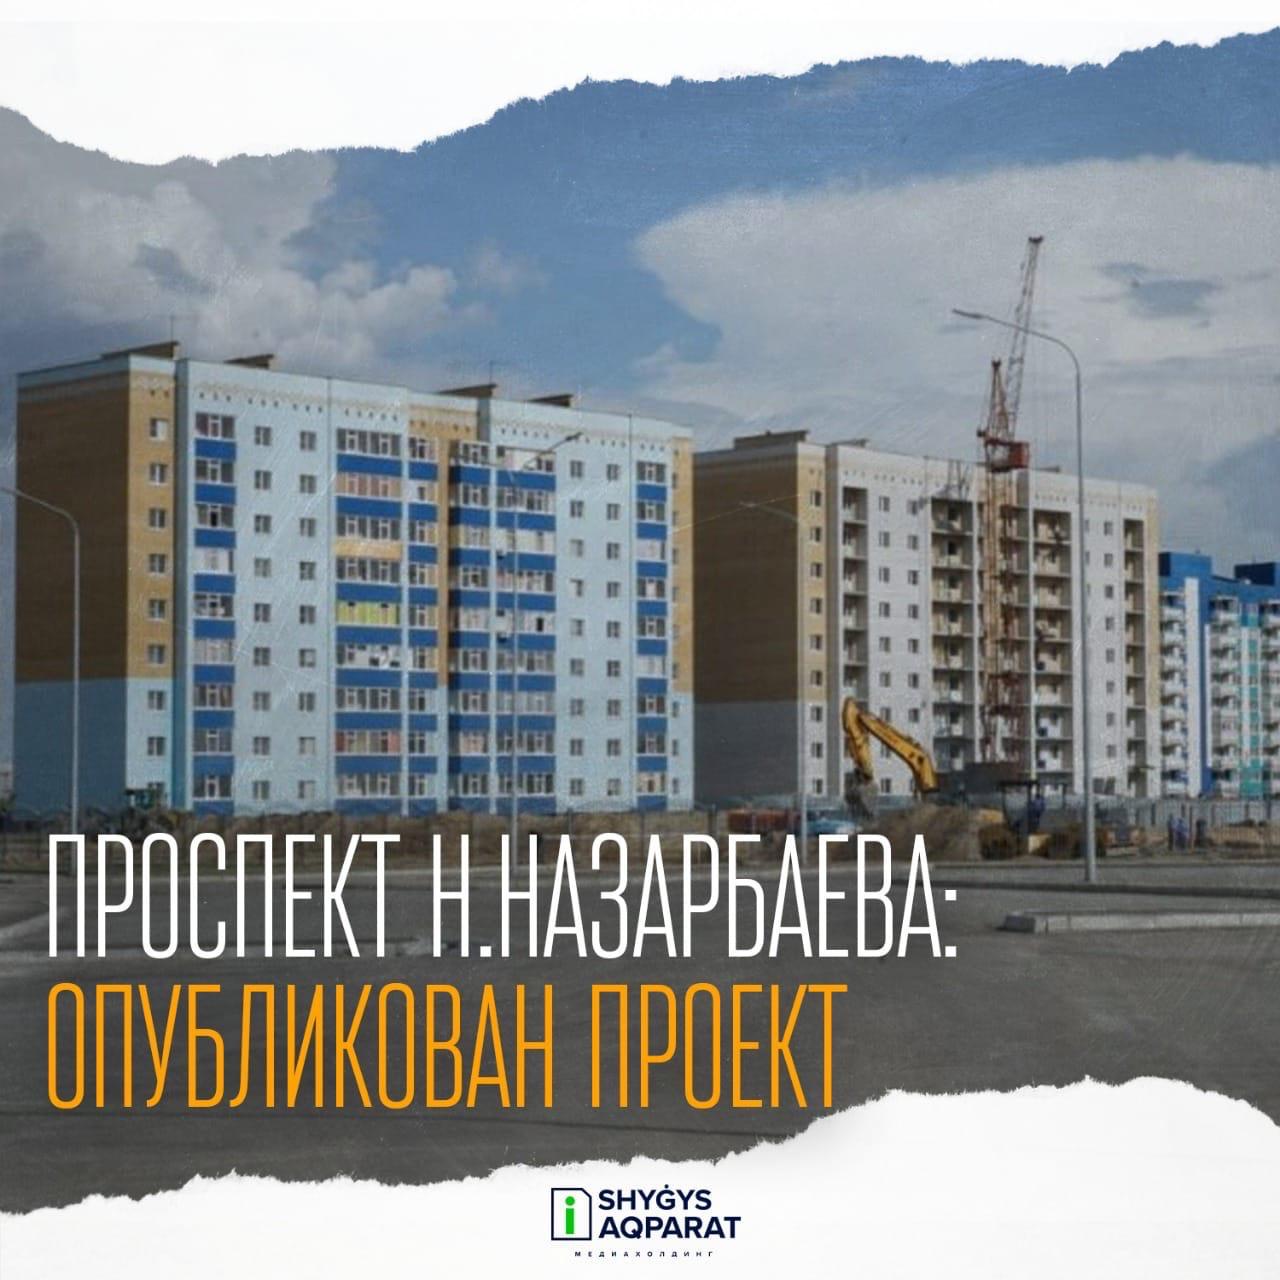 Проспект Н.Назарбаева: опубликован проект